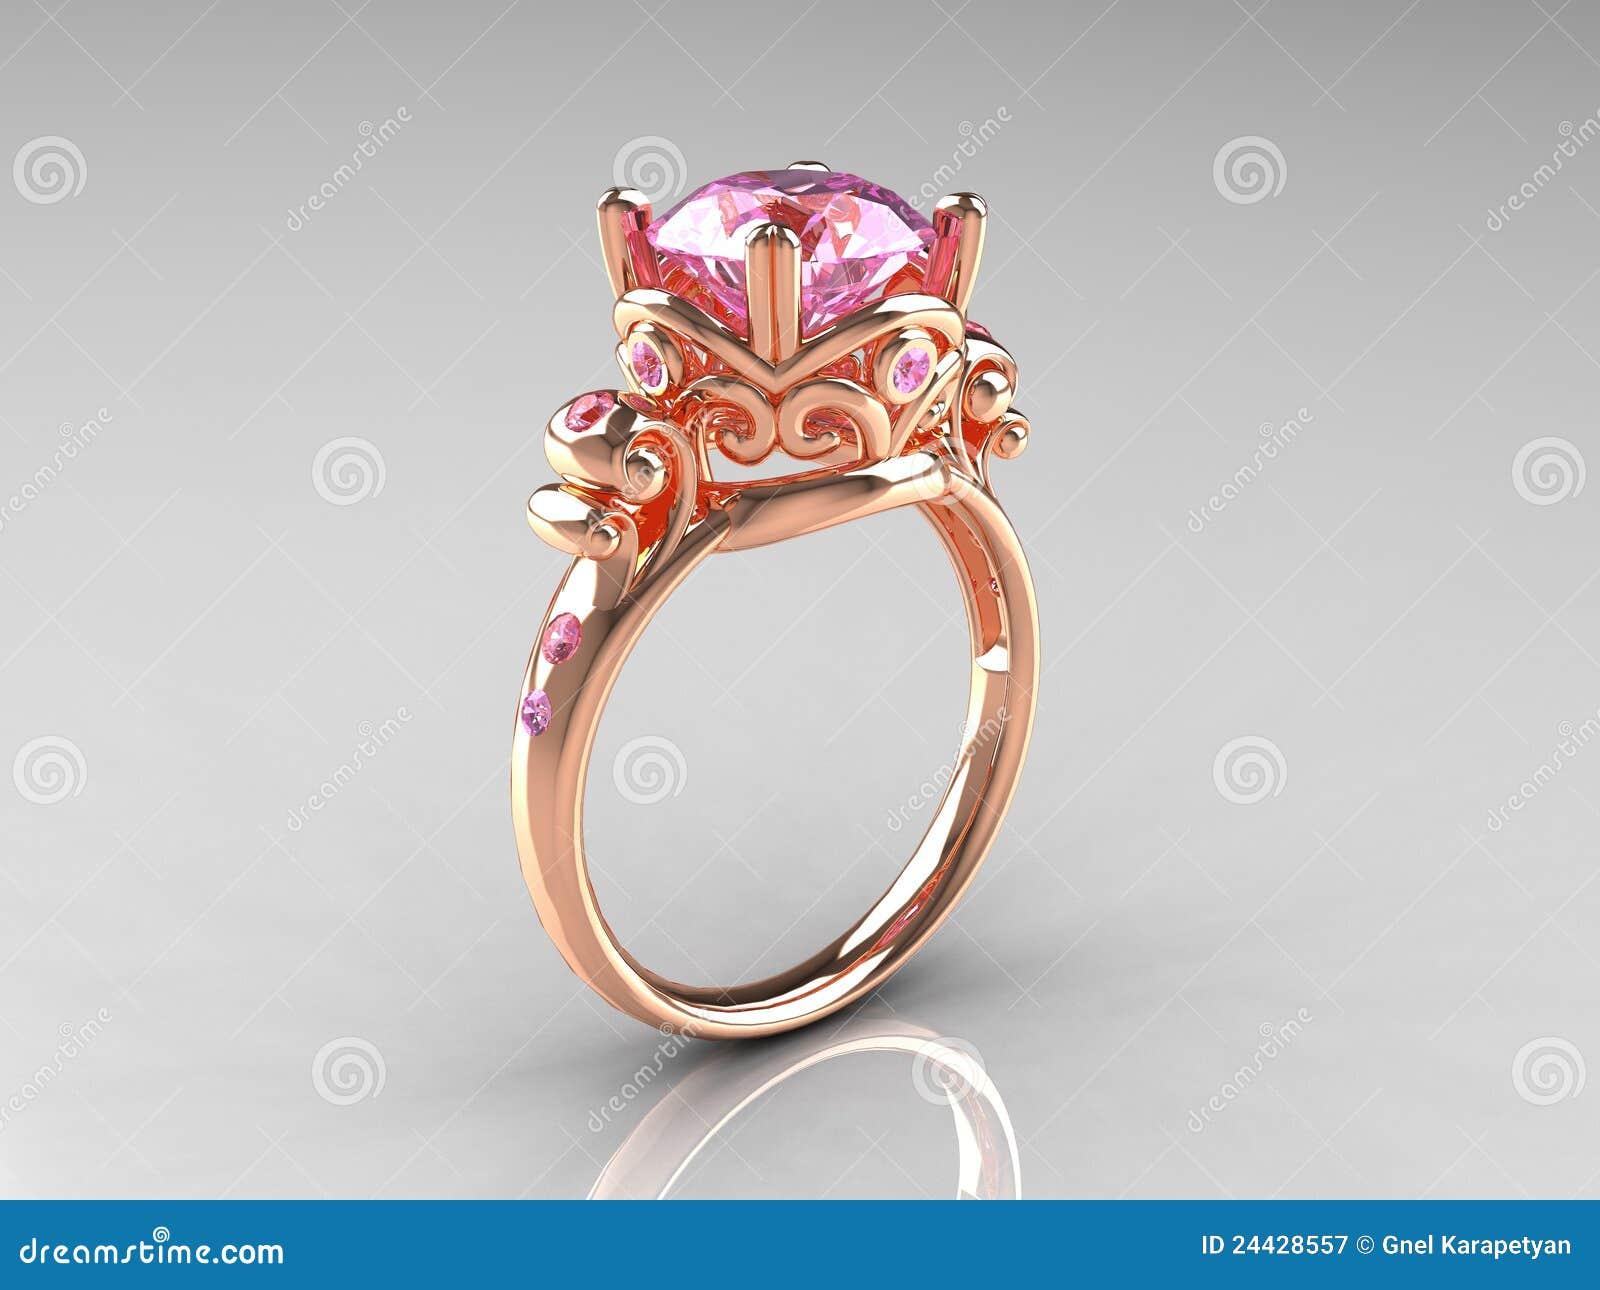 Promesas de amor Pink-sapphire-rose-gold-vintage-engagement-ring-24428557